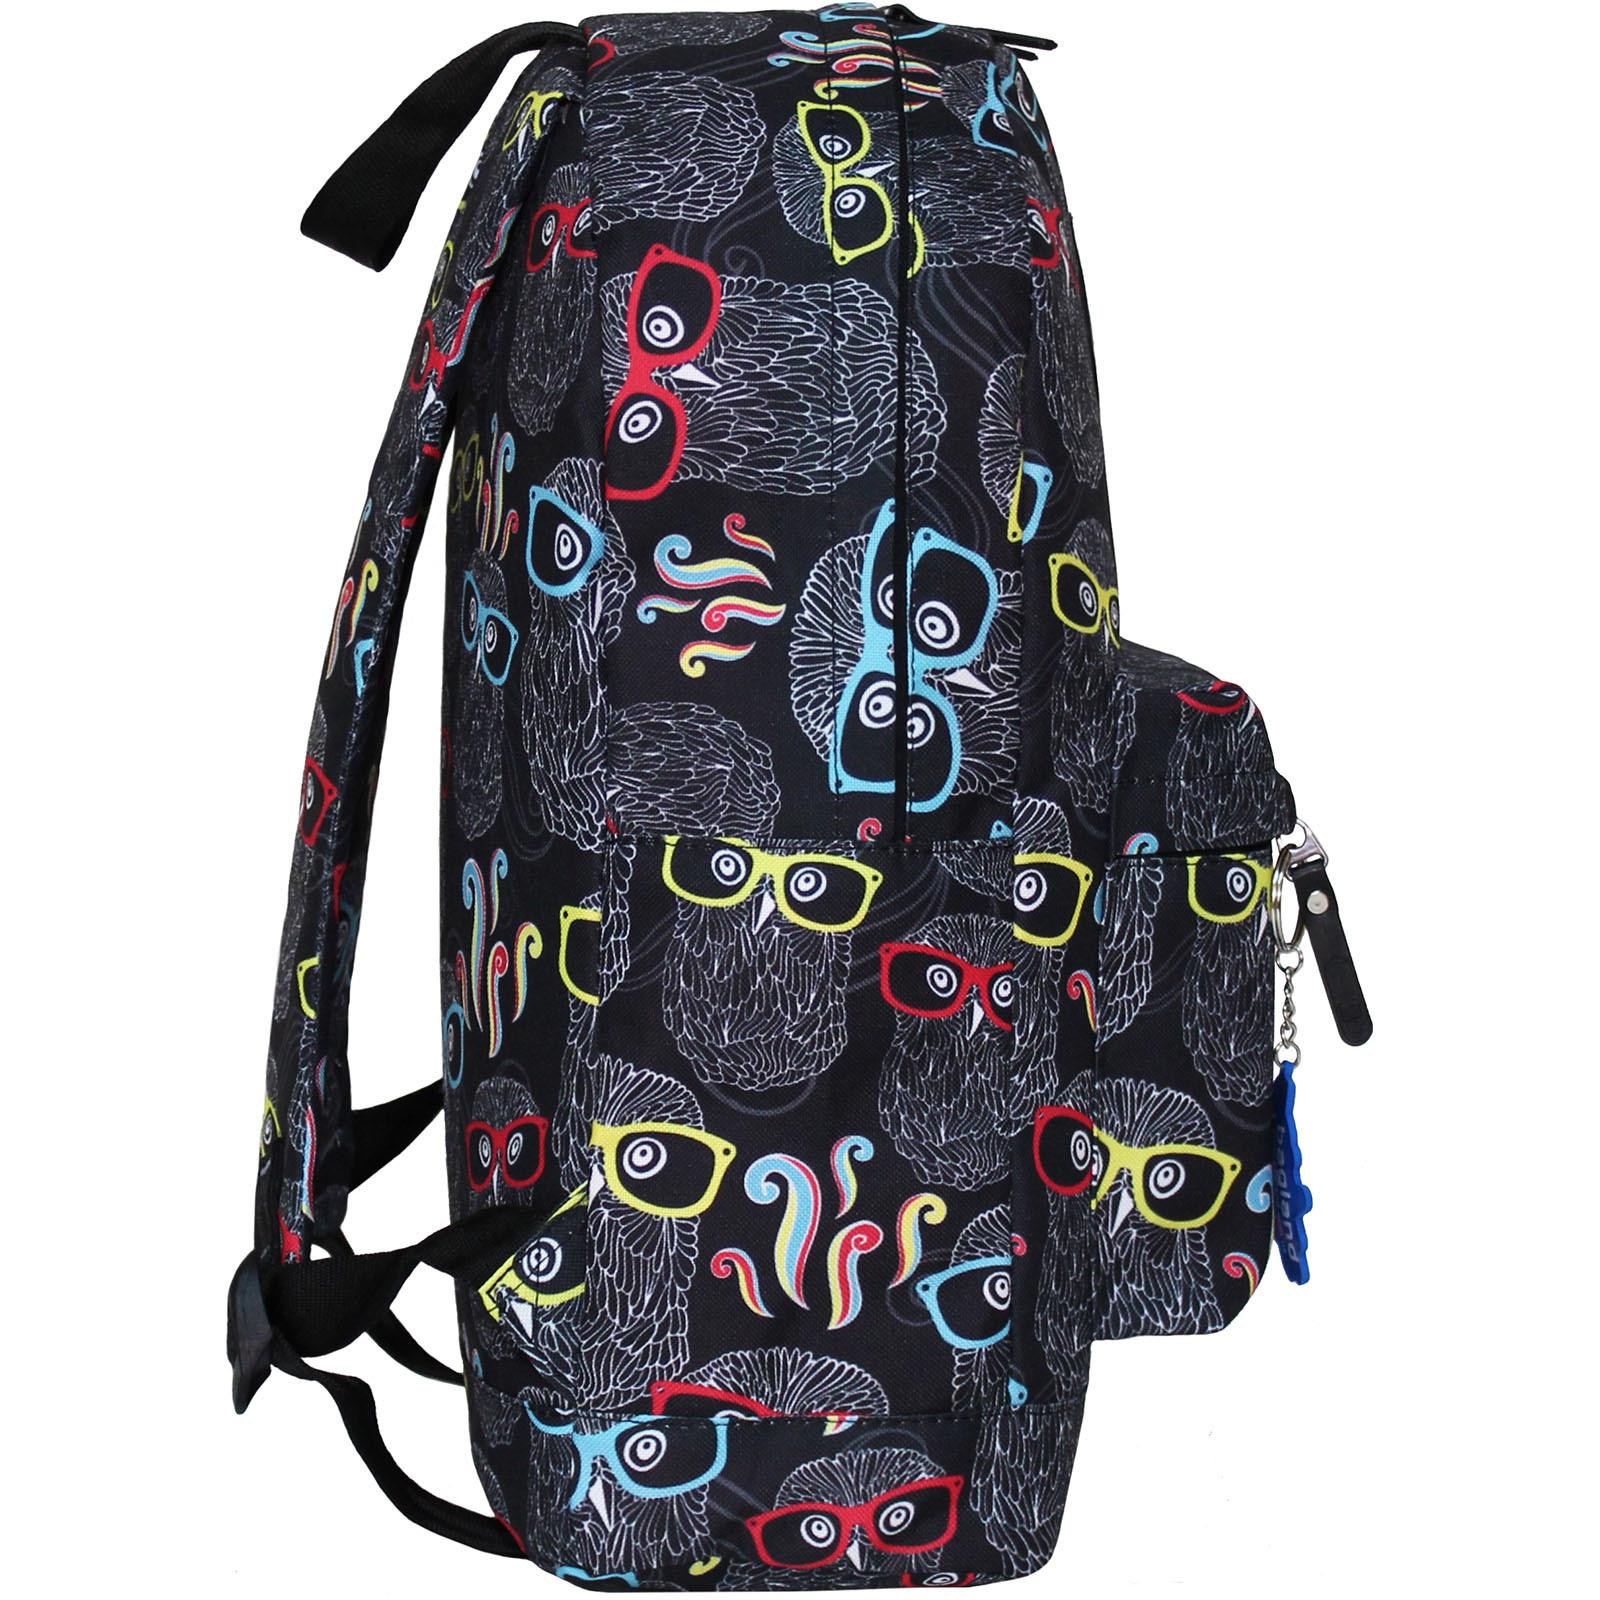 Рюкзак Bagland Молодежный (дизайн) 17 л. сублимация 403 (00533664)